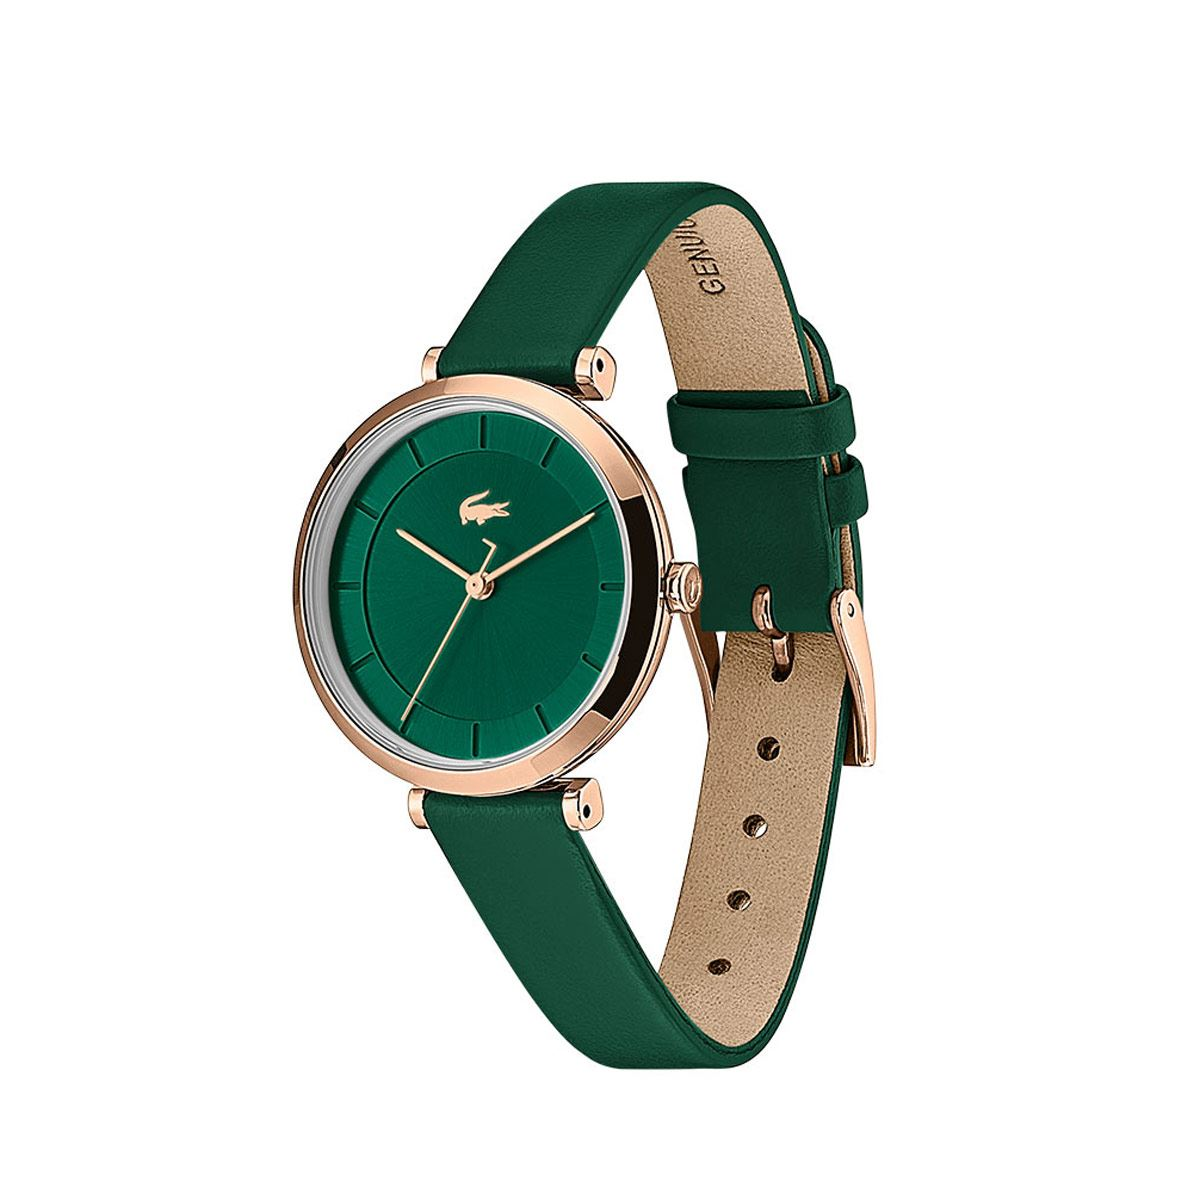 Reloj Lacoste 2001138 Verde